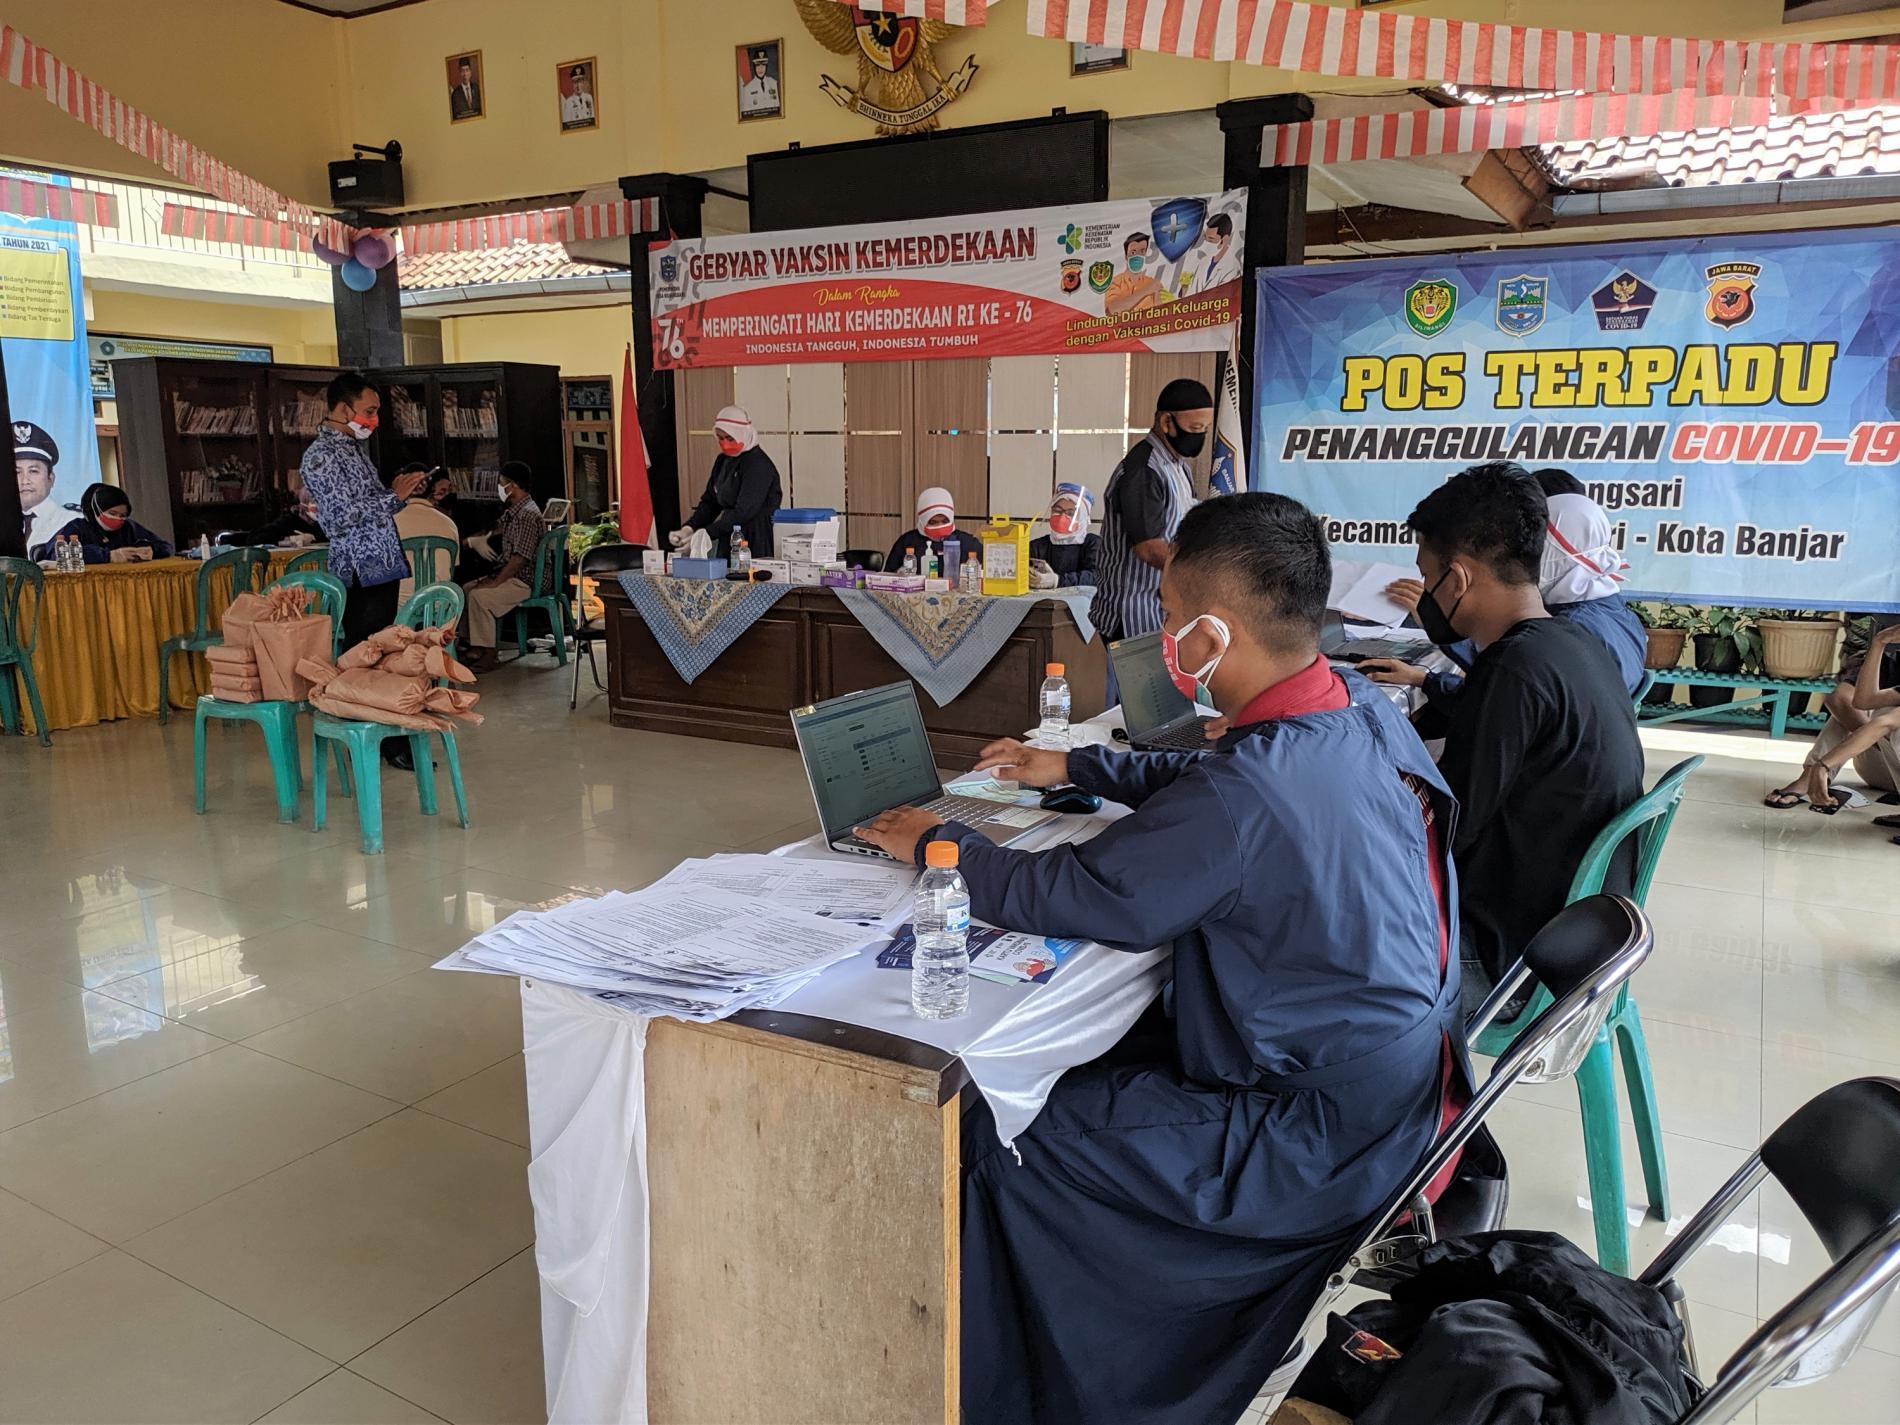 Bertepatan HUT RI, Pemdes Kujangsari Siapkan Doorprize Bagi Warga yang Mau Divaksin